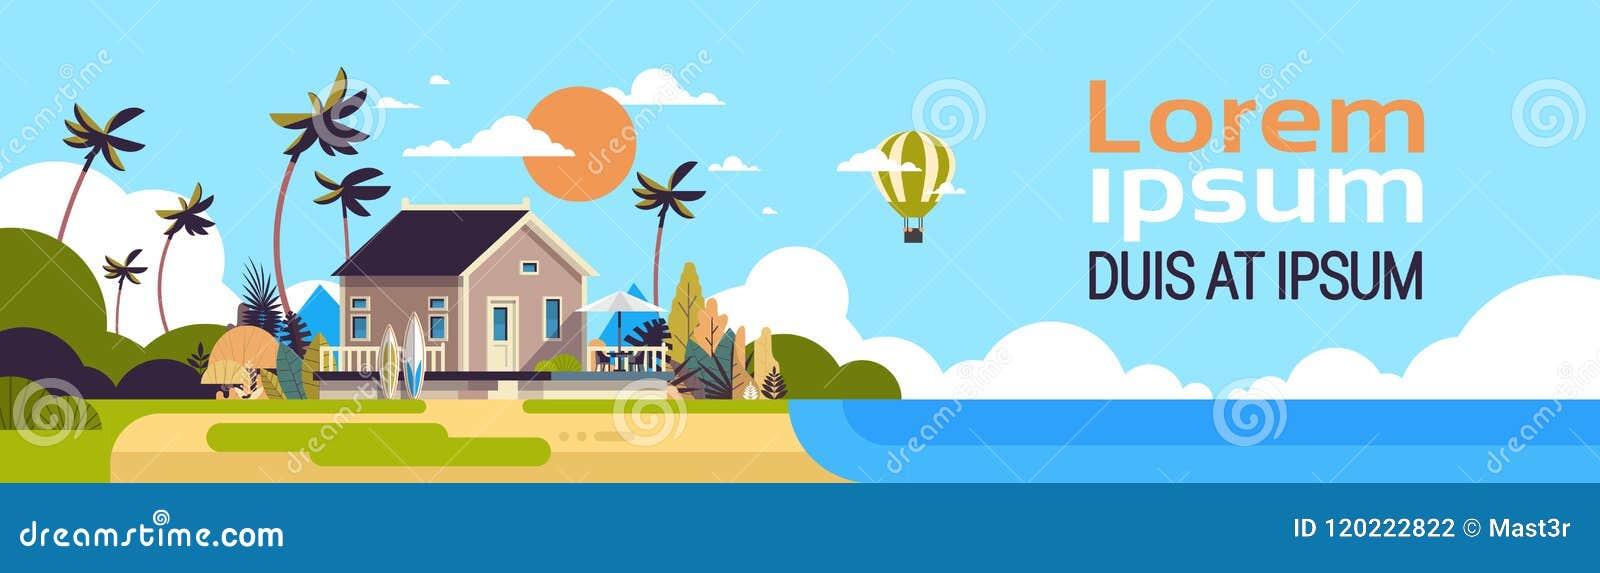 big summer villa house air balloon surf board palm trees greeting